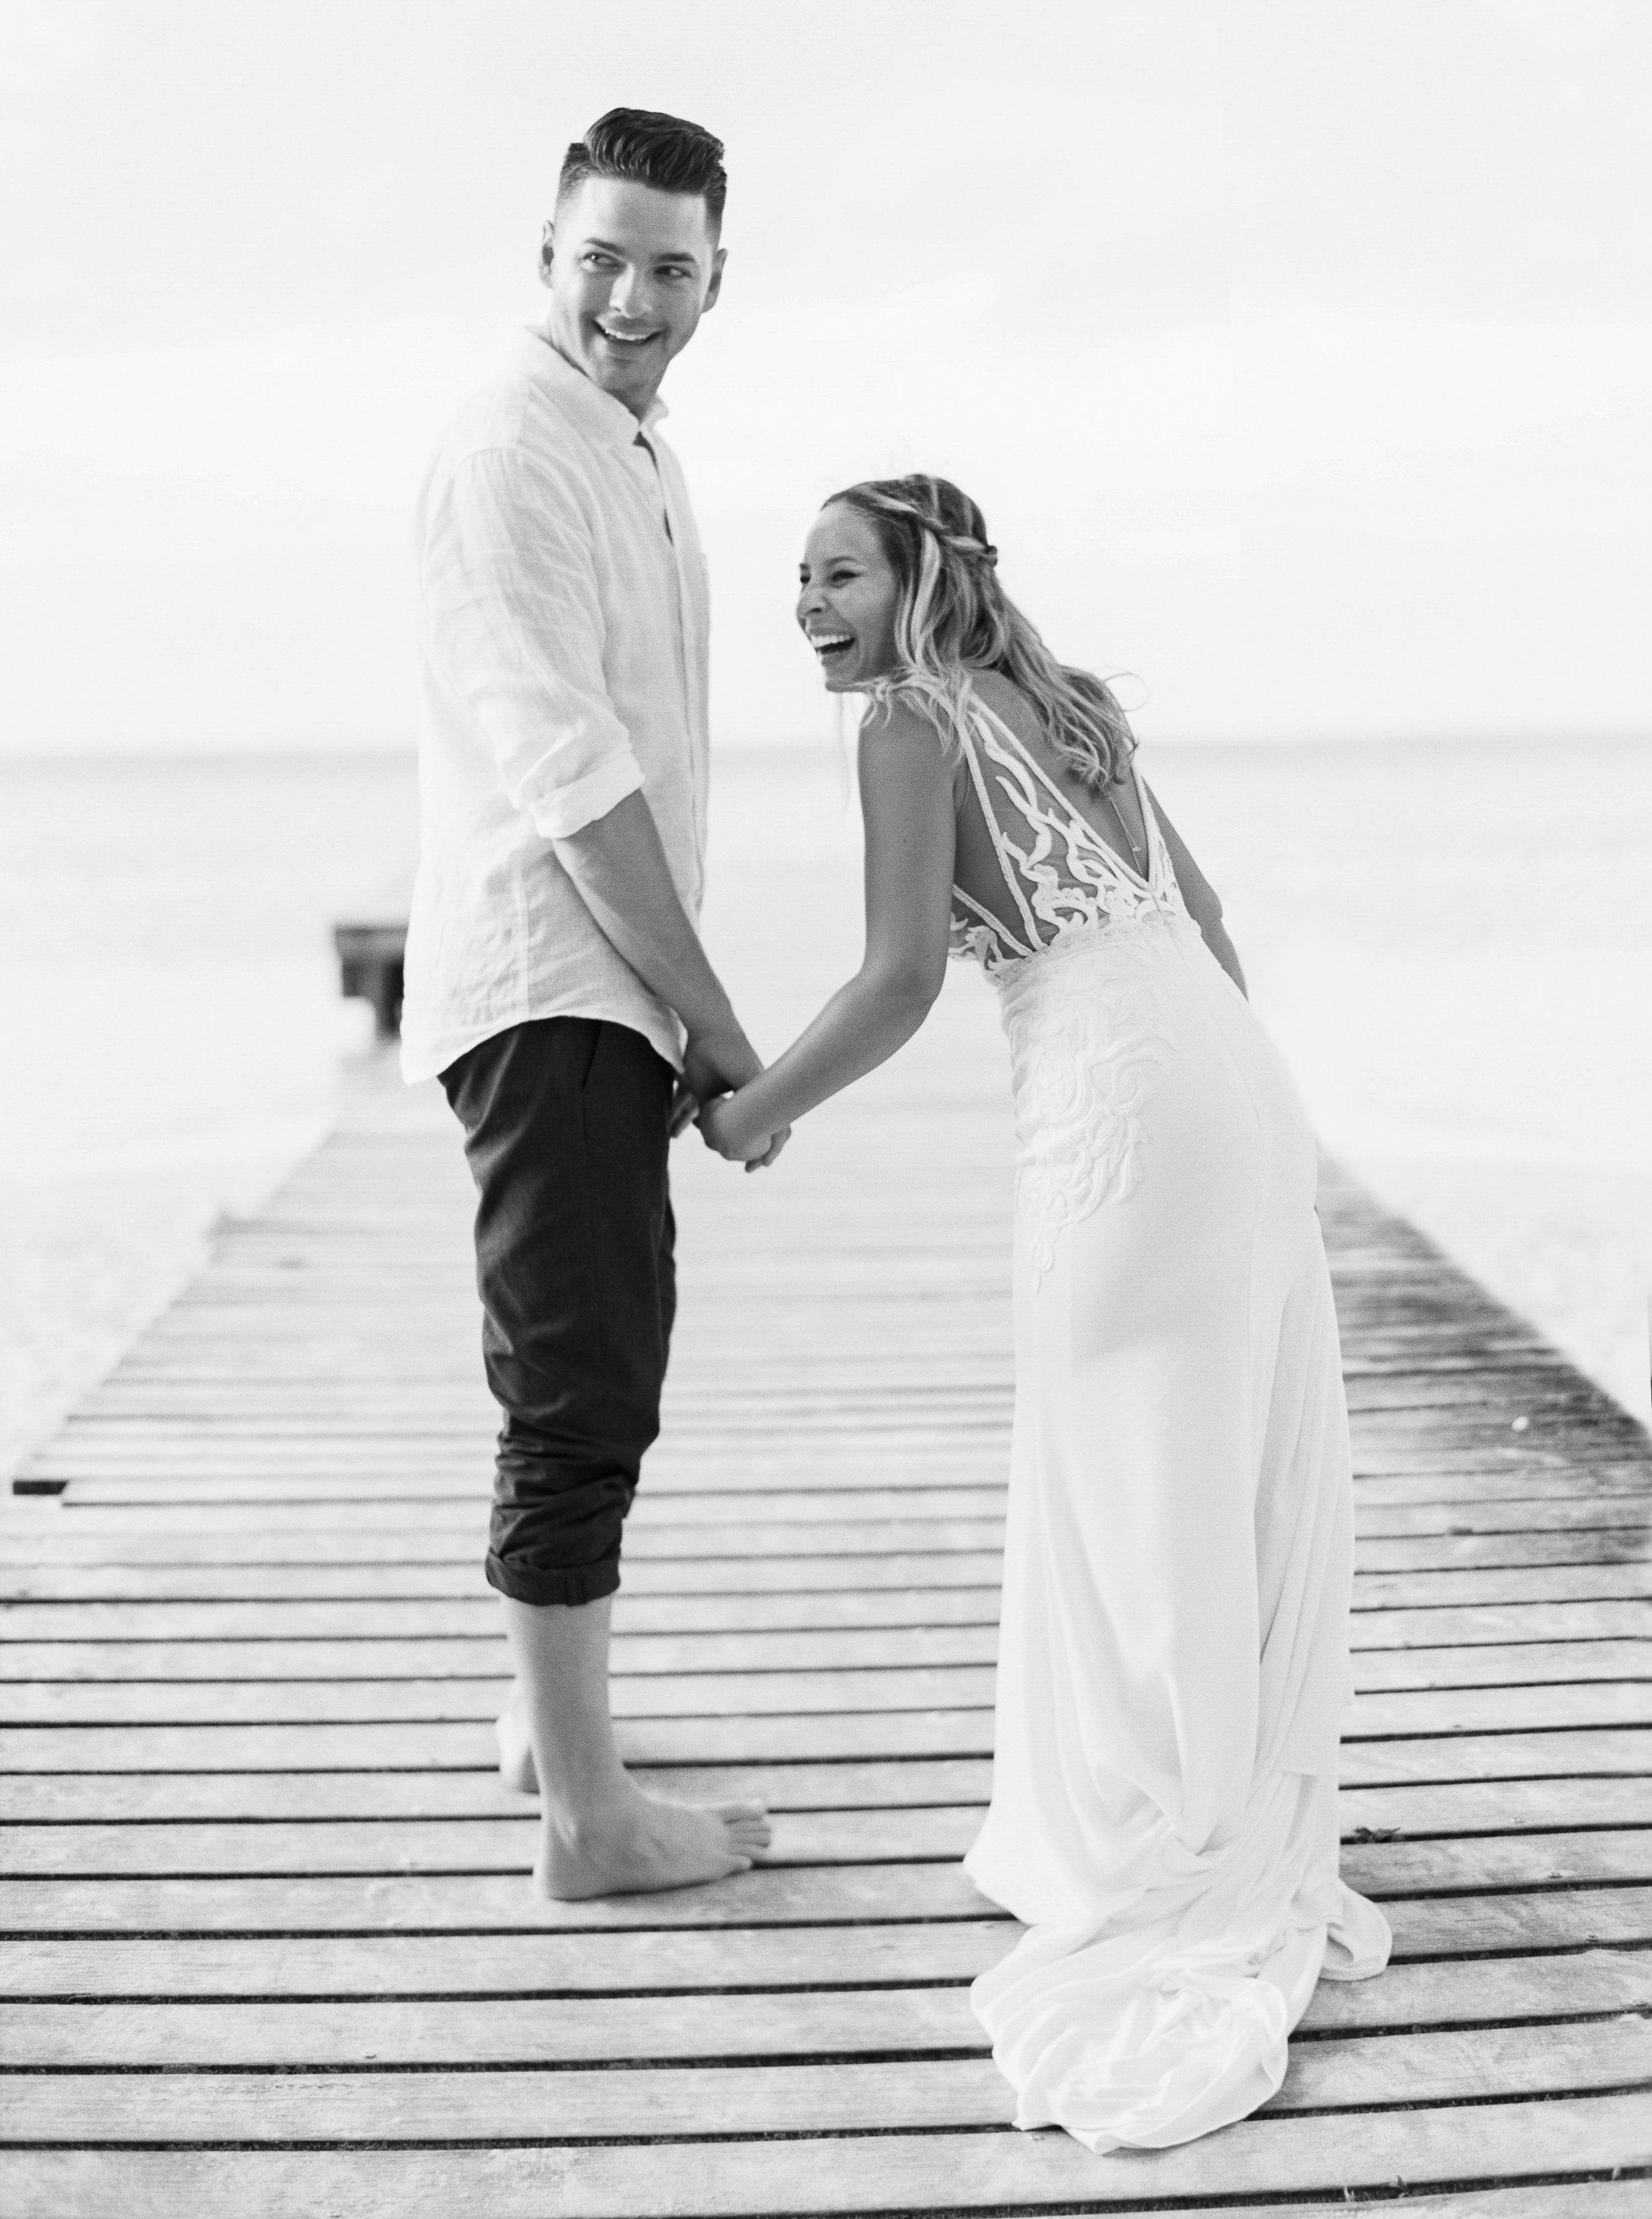 Moorea_Wedding_Elopement_Photographer_Videographer_118 copy_1.jpg